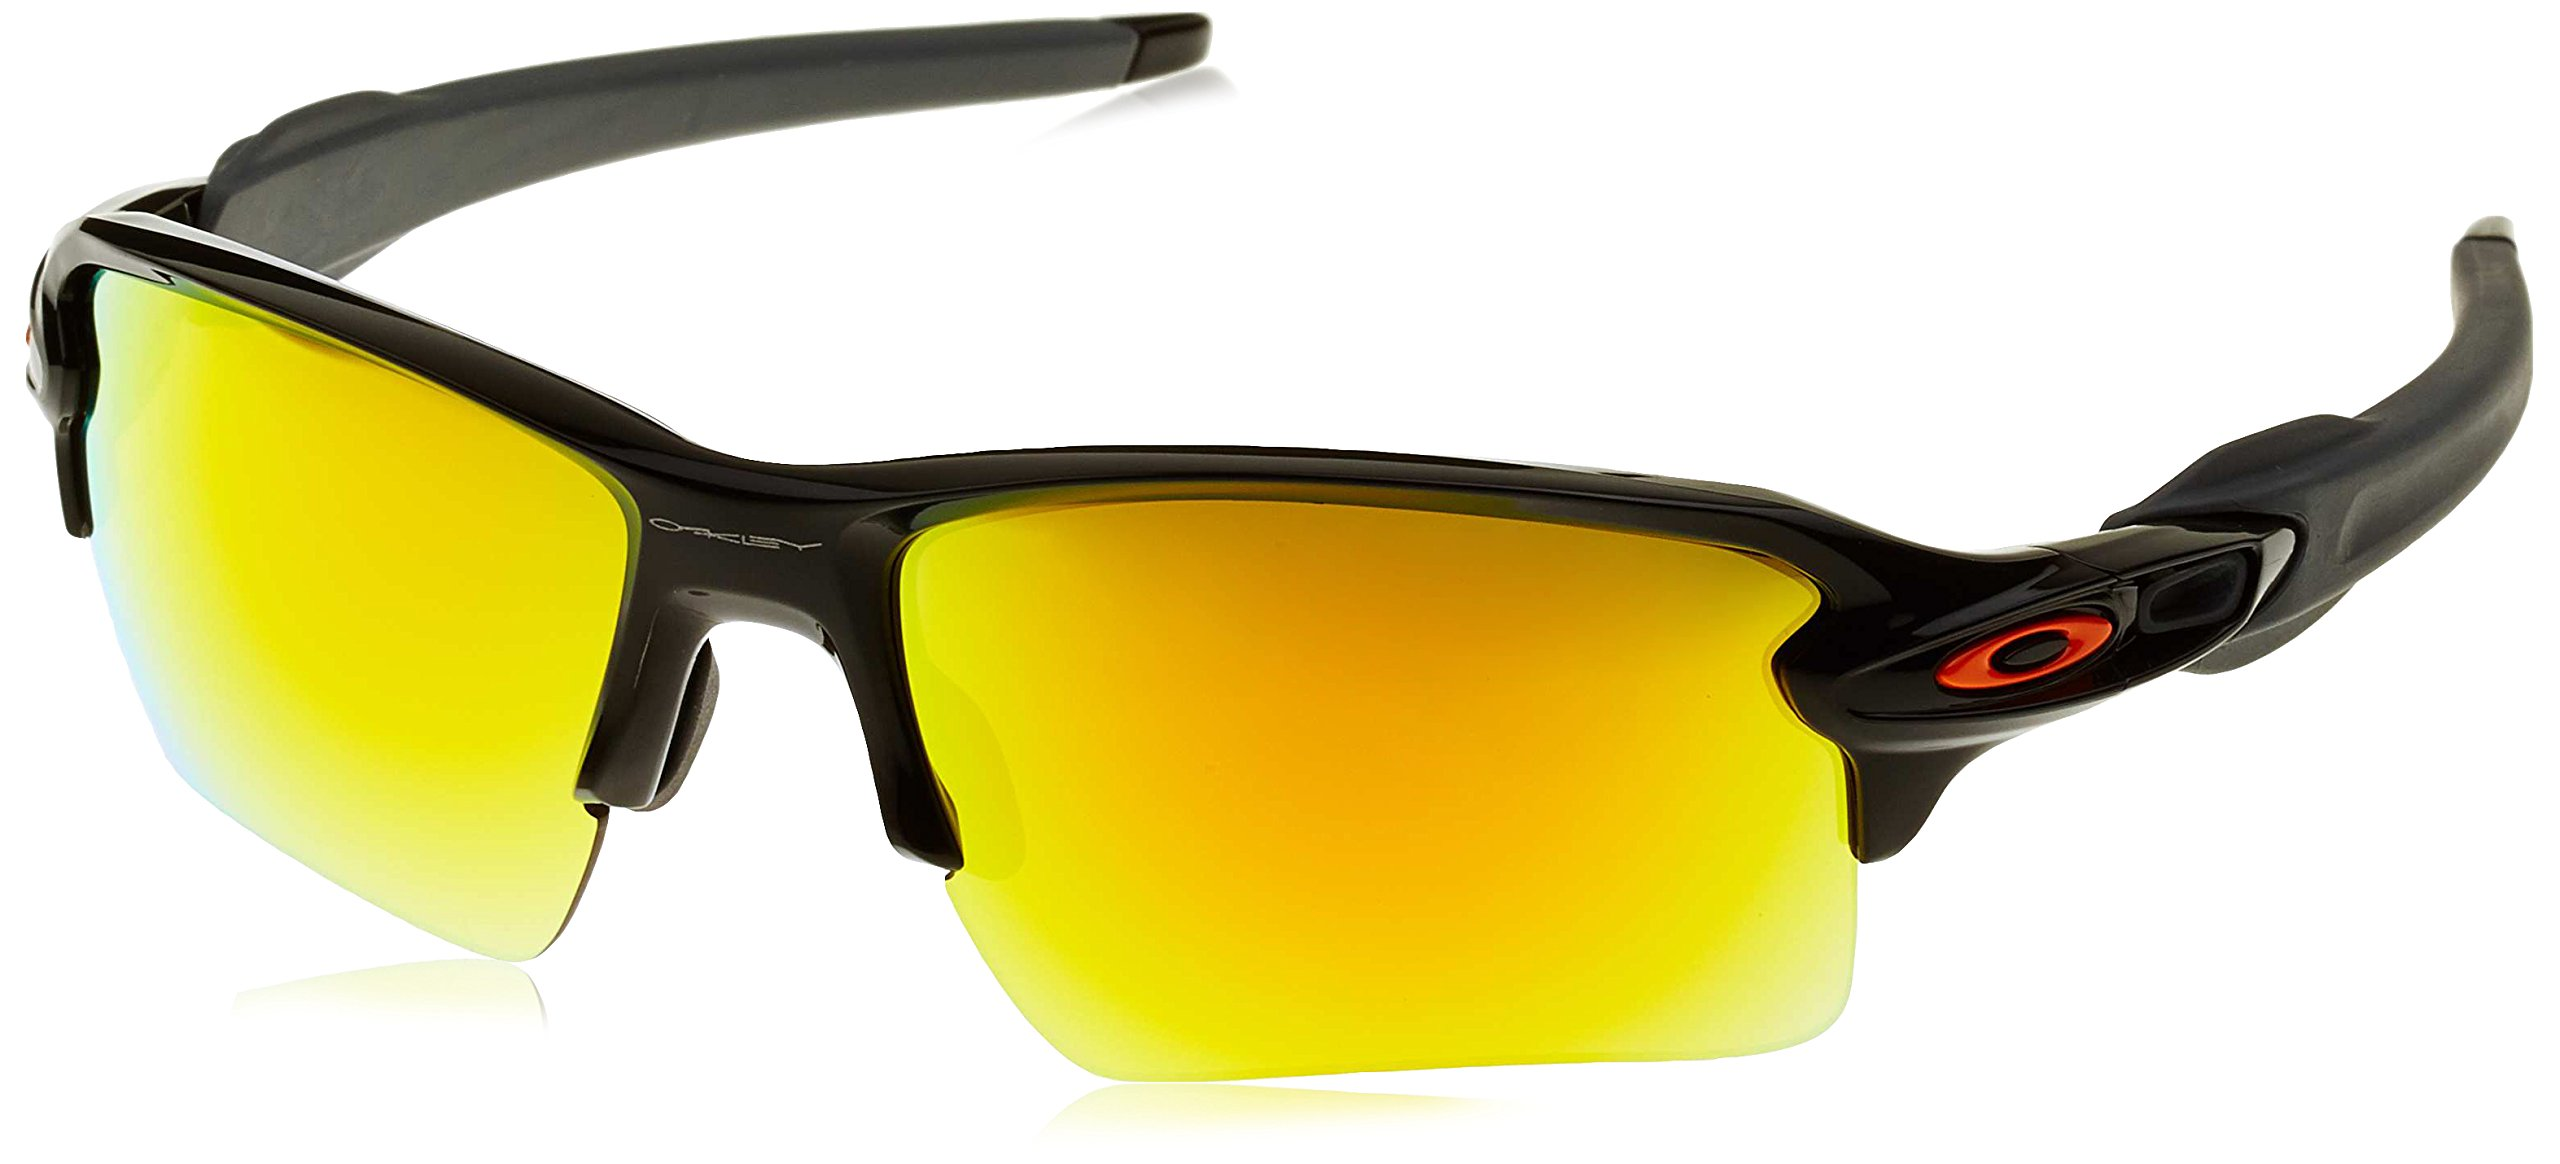 Oakley Men's Flak 2.0 Xl Non-Polarized Iridium Rectangular Sunglasses, Polished Black w/Fire Iridium, 59 mm